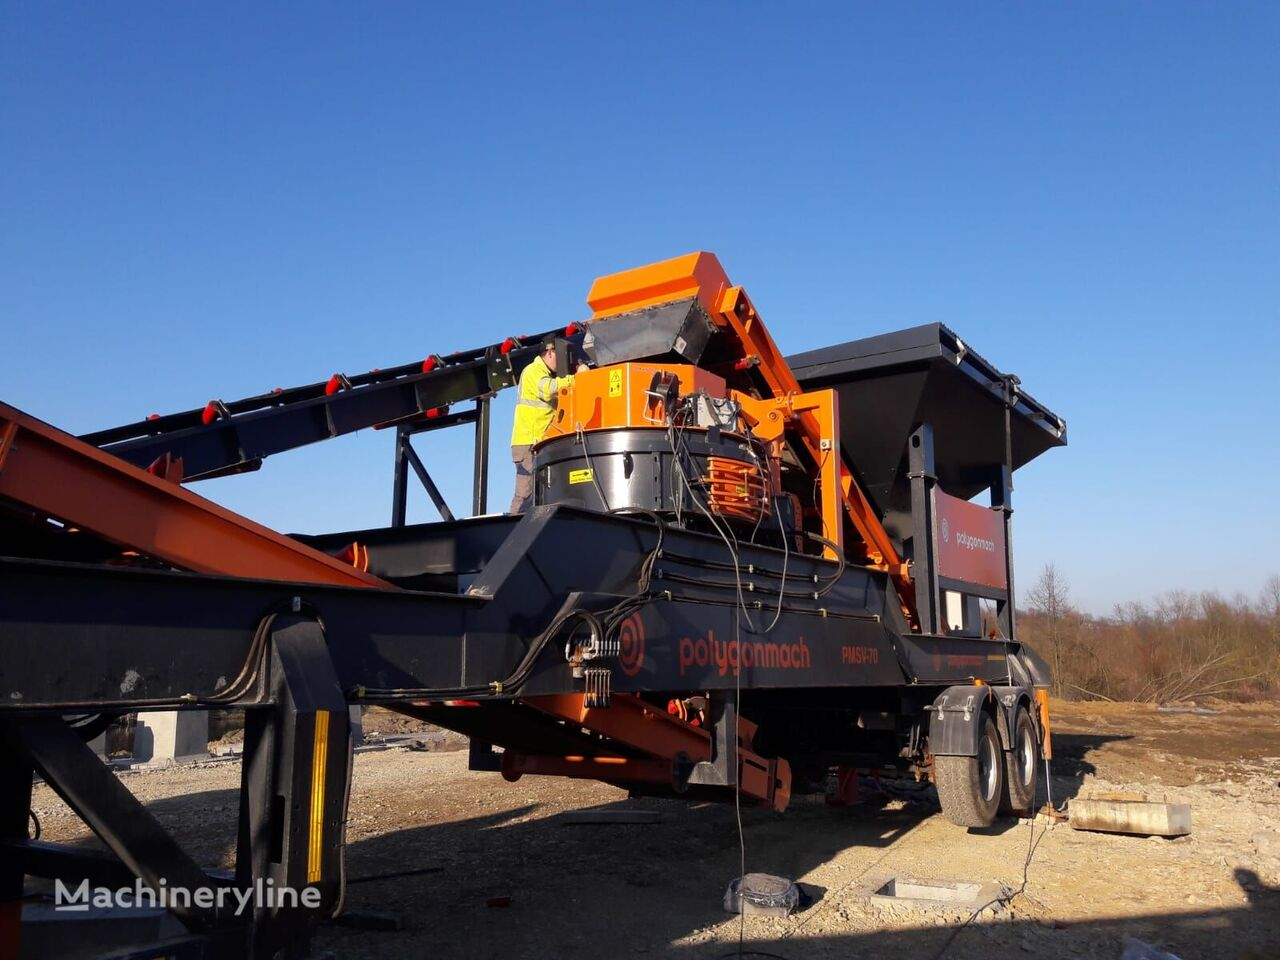 новая камнедробилка POLYGONMACH VSI-700/800/900 VERTICAL SHAFT IMPACTOR